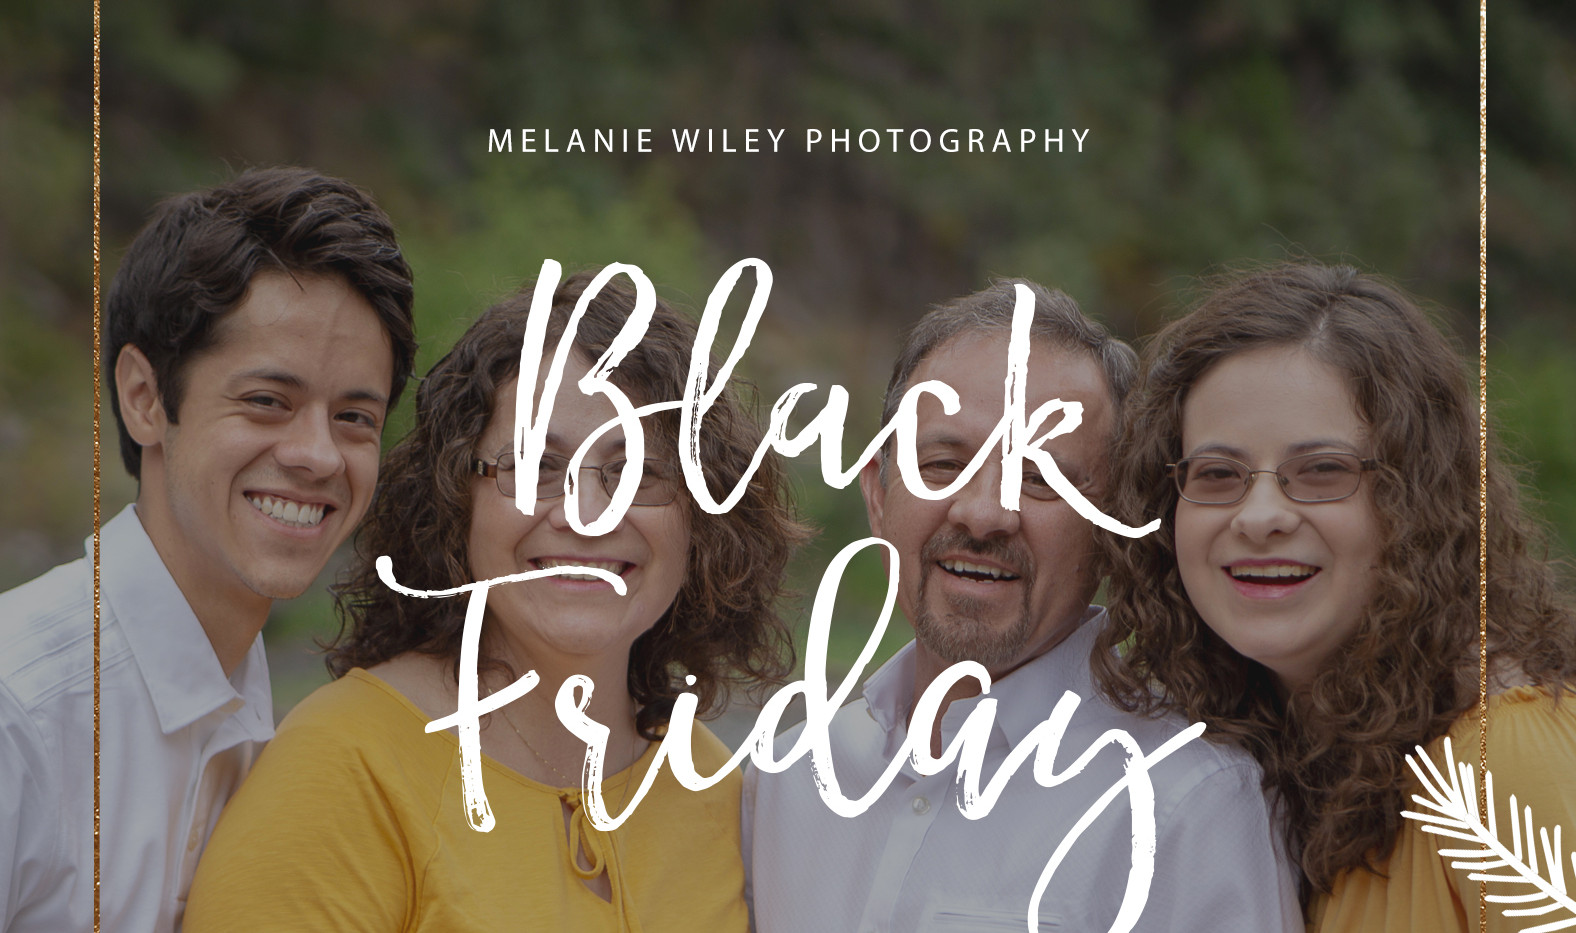 MWP BLACK FRIDAY.jpg